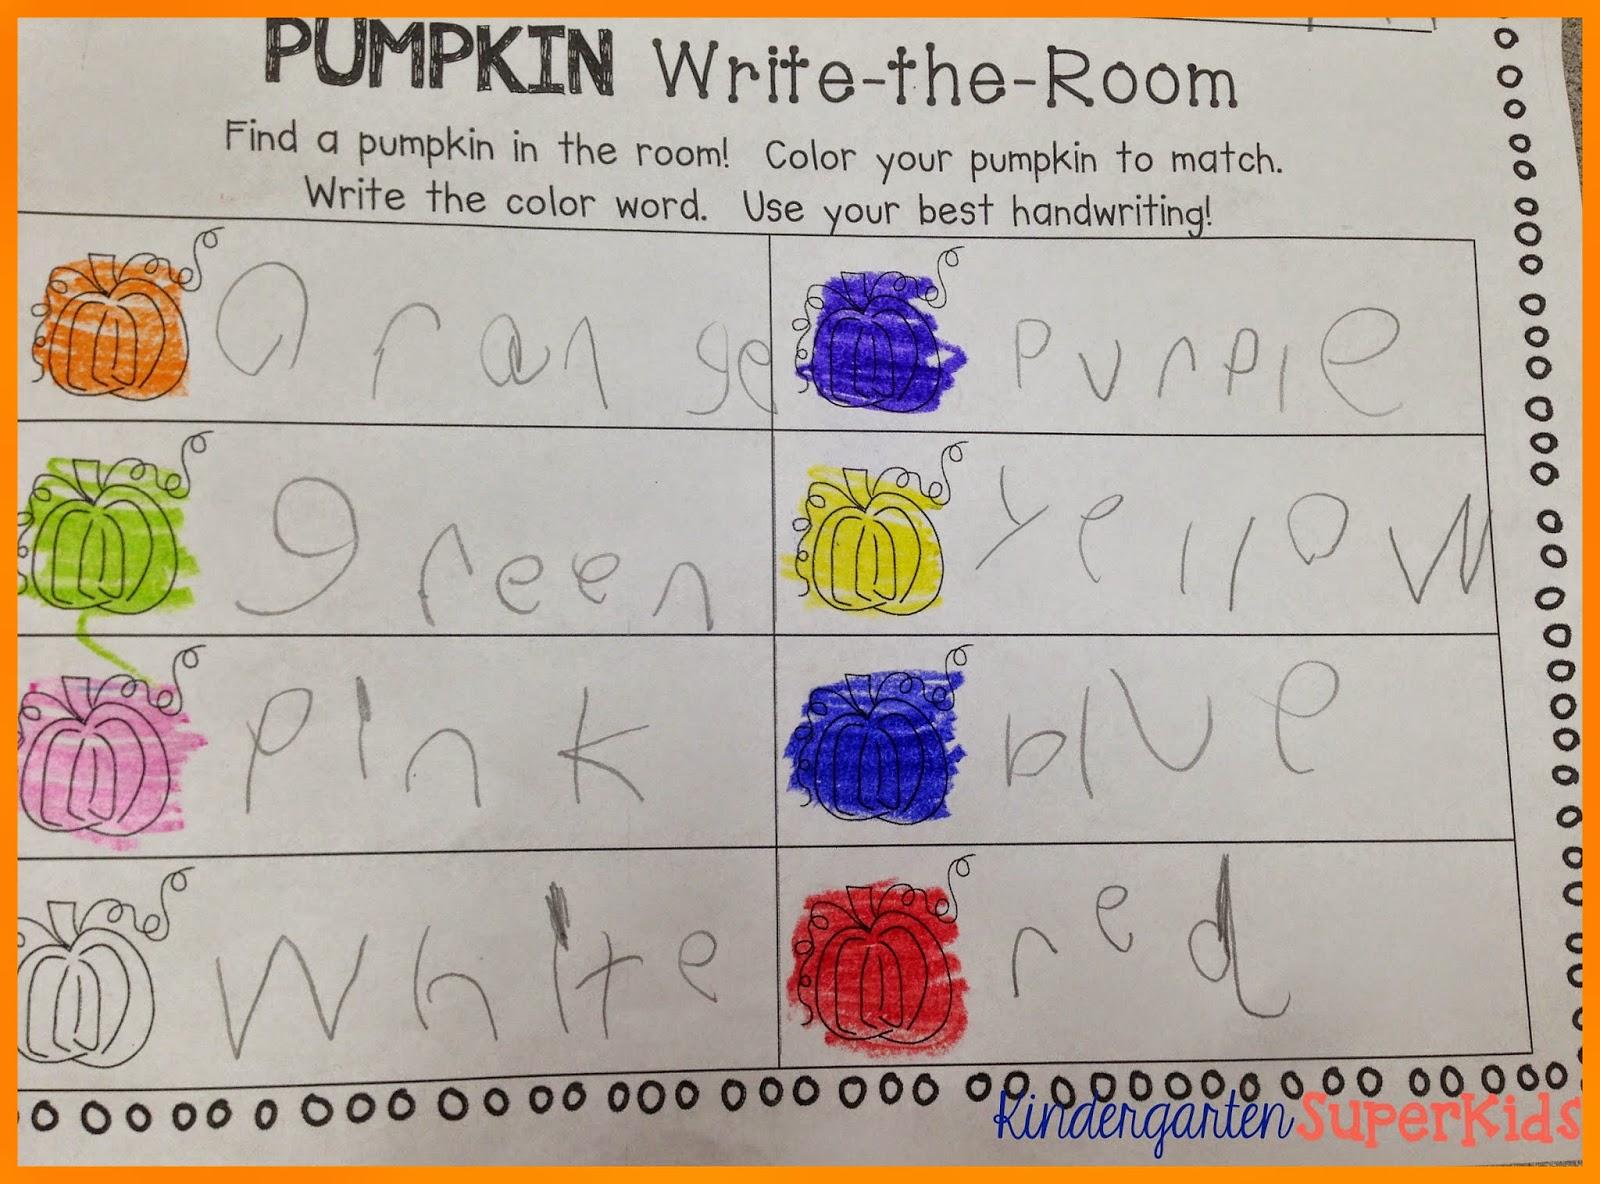 http://www.teacherspayteachers.com/Product/Pumpkin-Color-Words-Write-the-Room-1510380